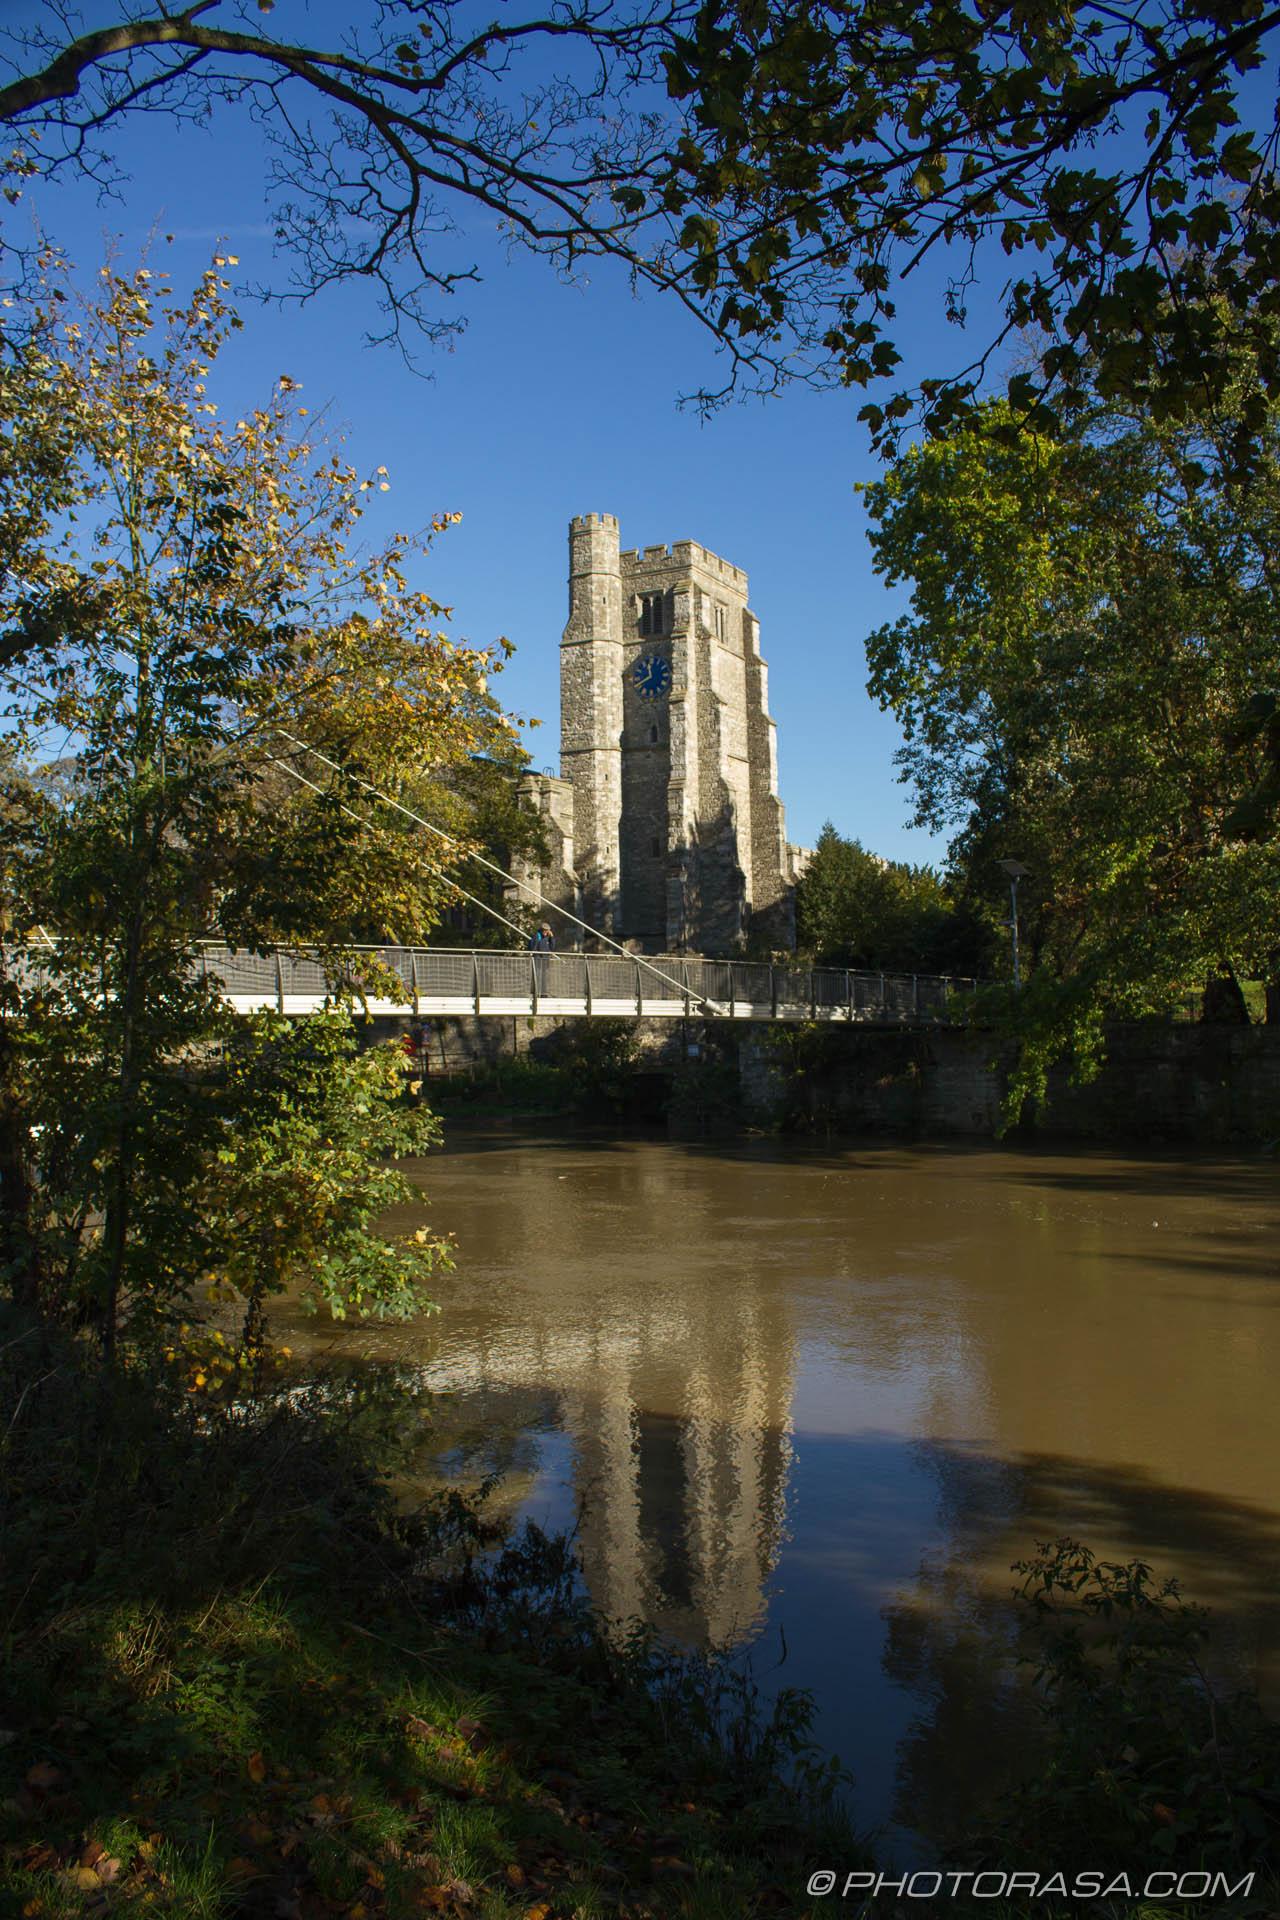 https://photorasa.com/inside-all-saints-church-in-maidstone/all-saints-church-from-across-the-river/